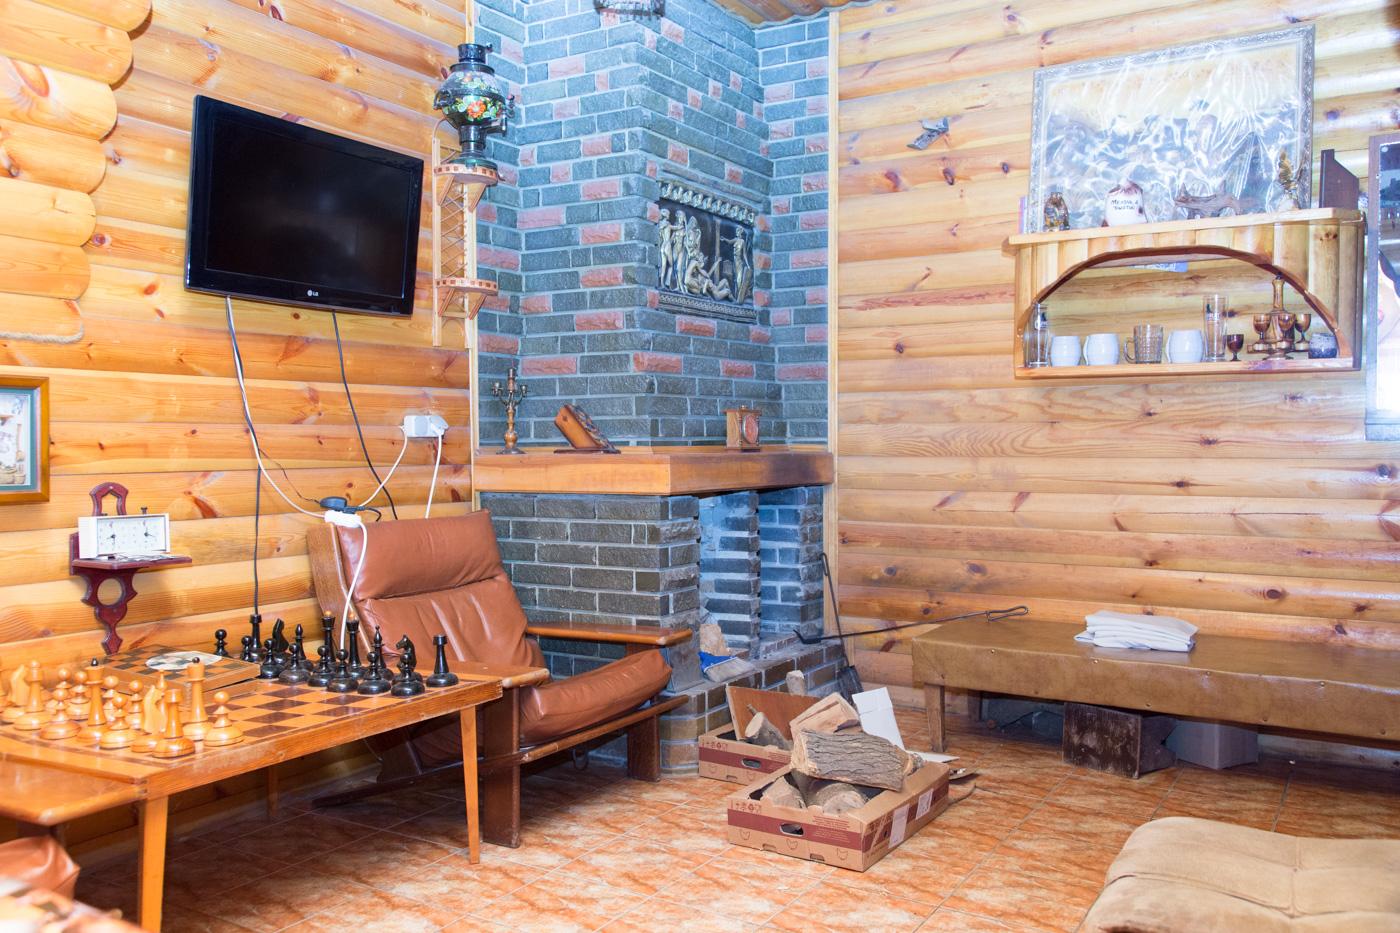 База отдыха Альтернатива, русская баня